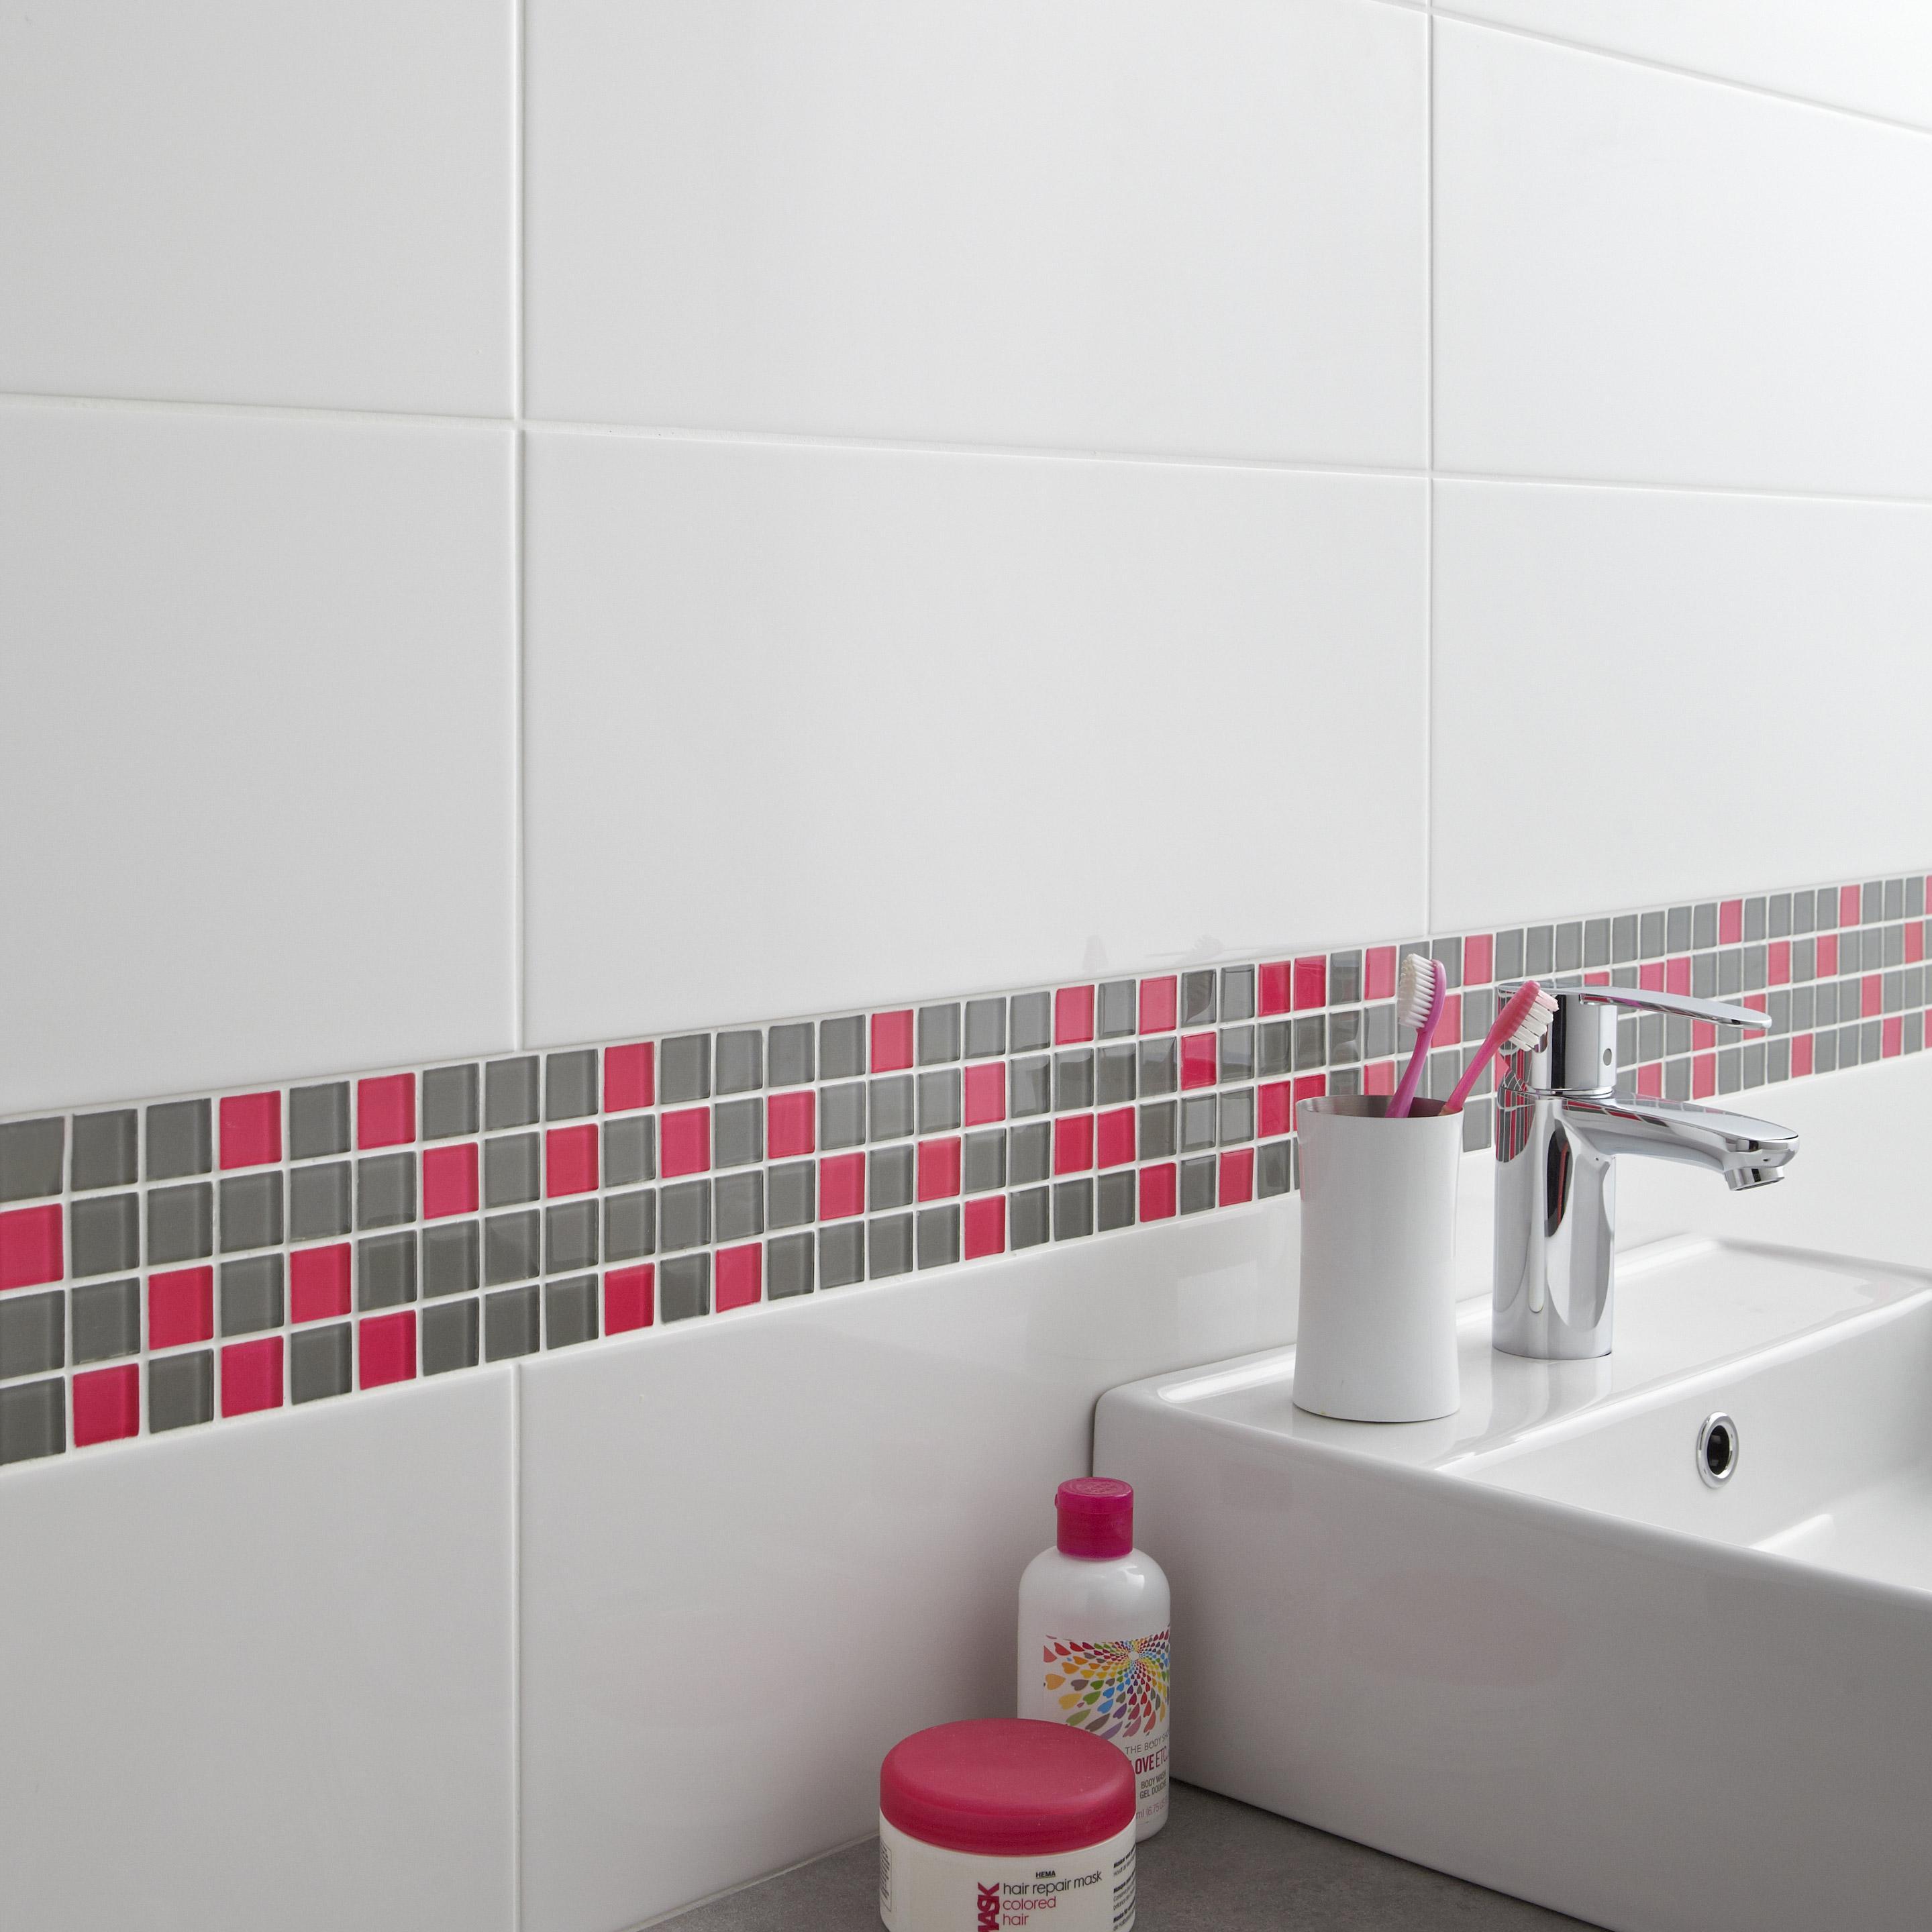 Faïence mur forte uni blanc-blanc n°0 brillant l.20 x L.50.2 cm, Loft